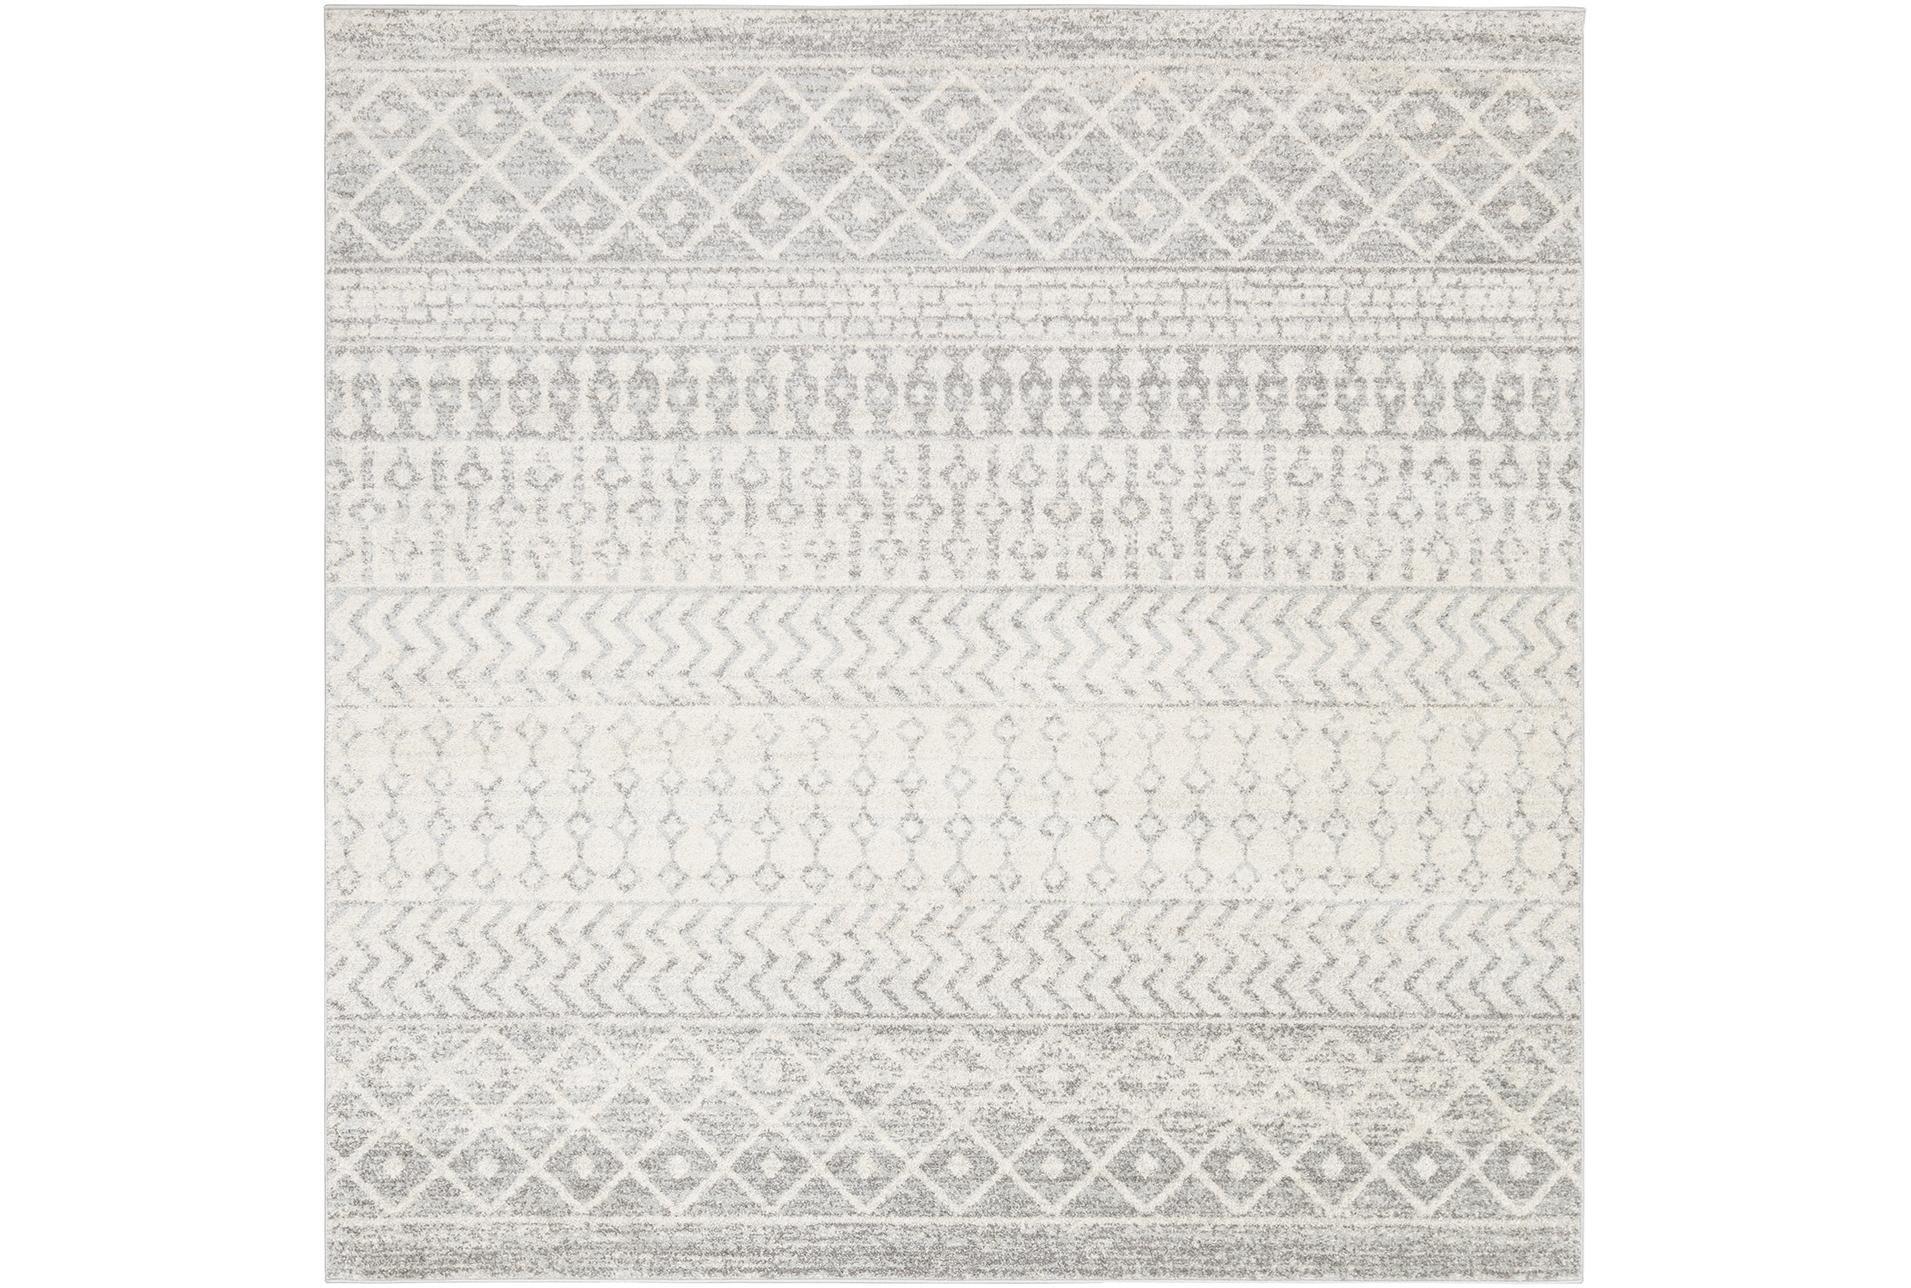 Square Rug Global Grey And White Stripe